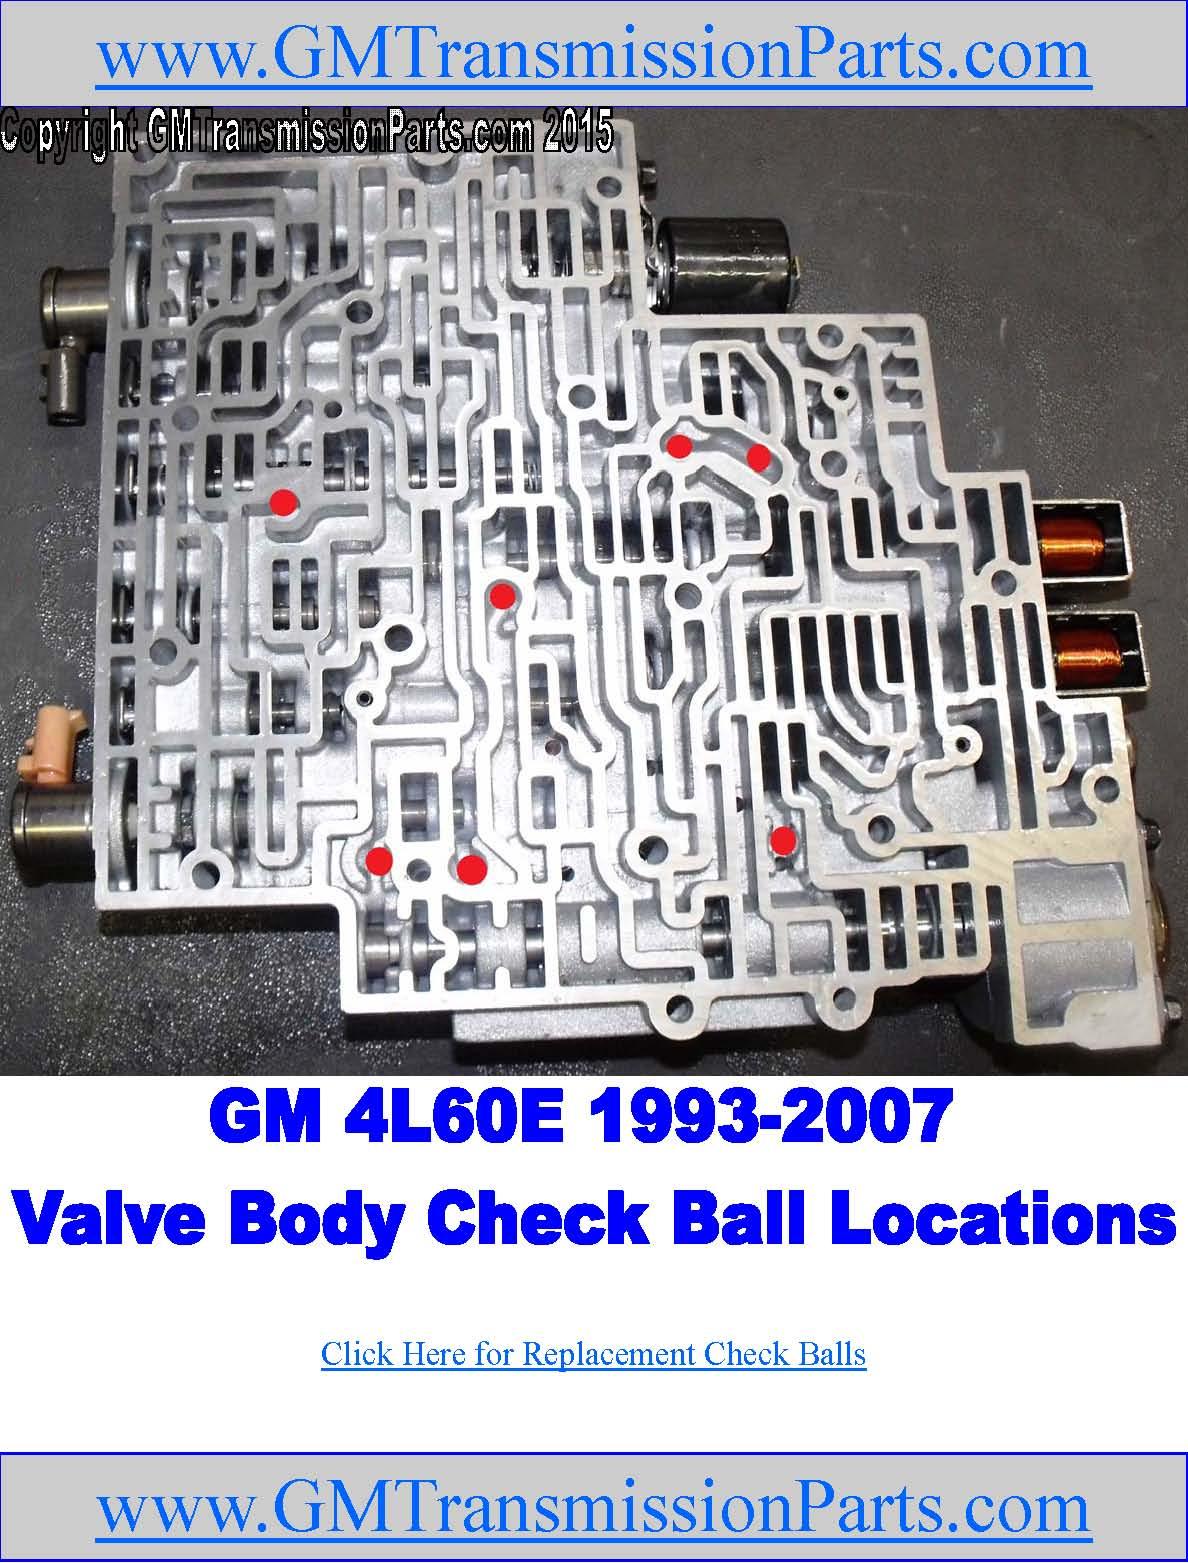 hight resolution of 4t65e diagram checkball simple wiring diagrams th125 valve body diagram 4t65e diagram checkball wiring diagram blog